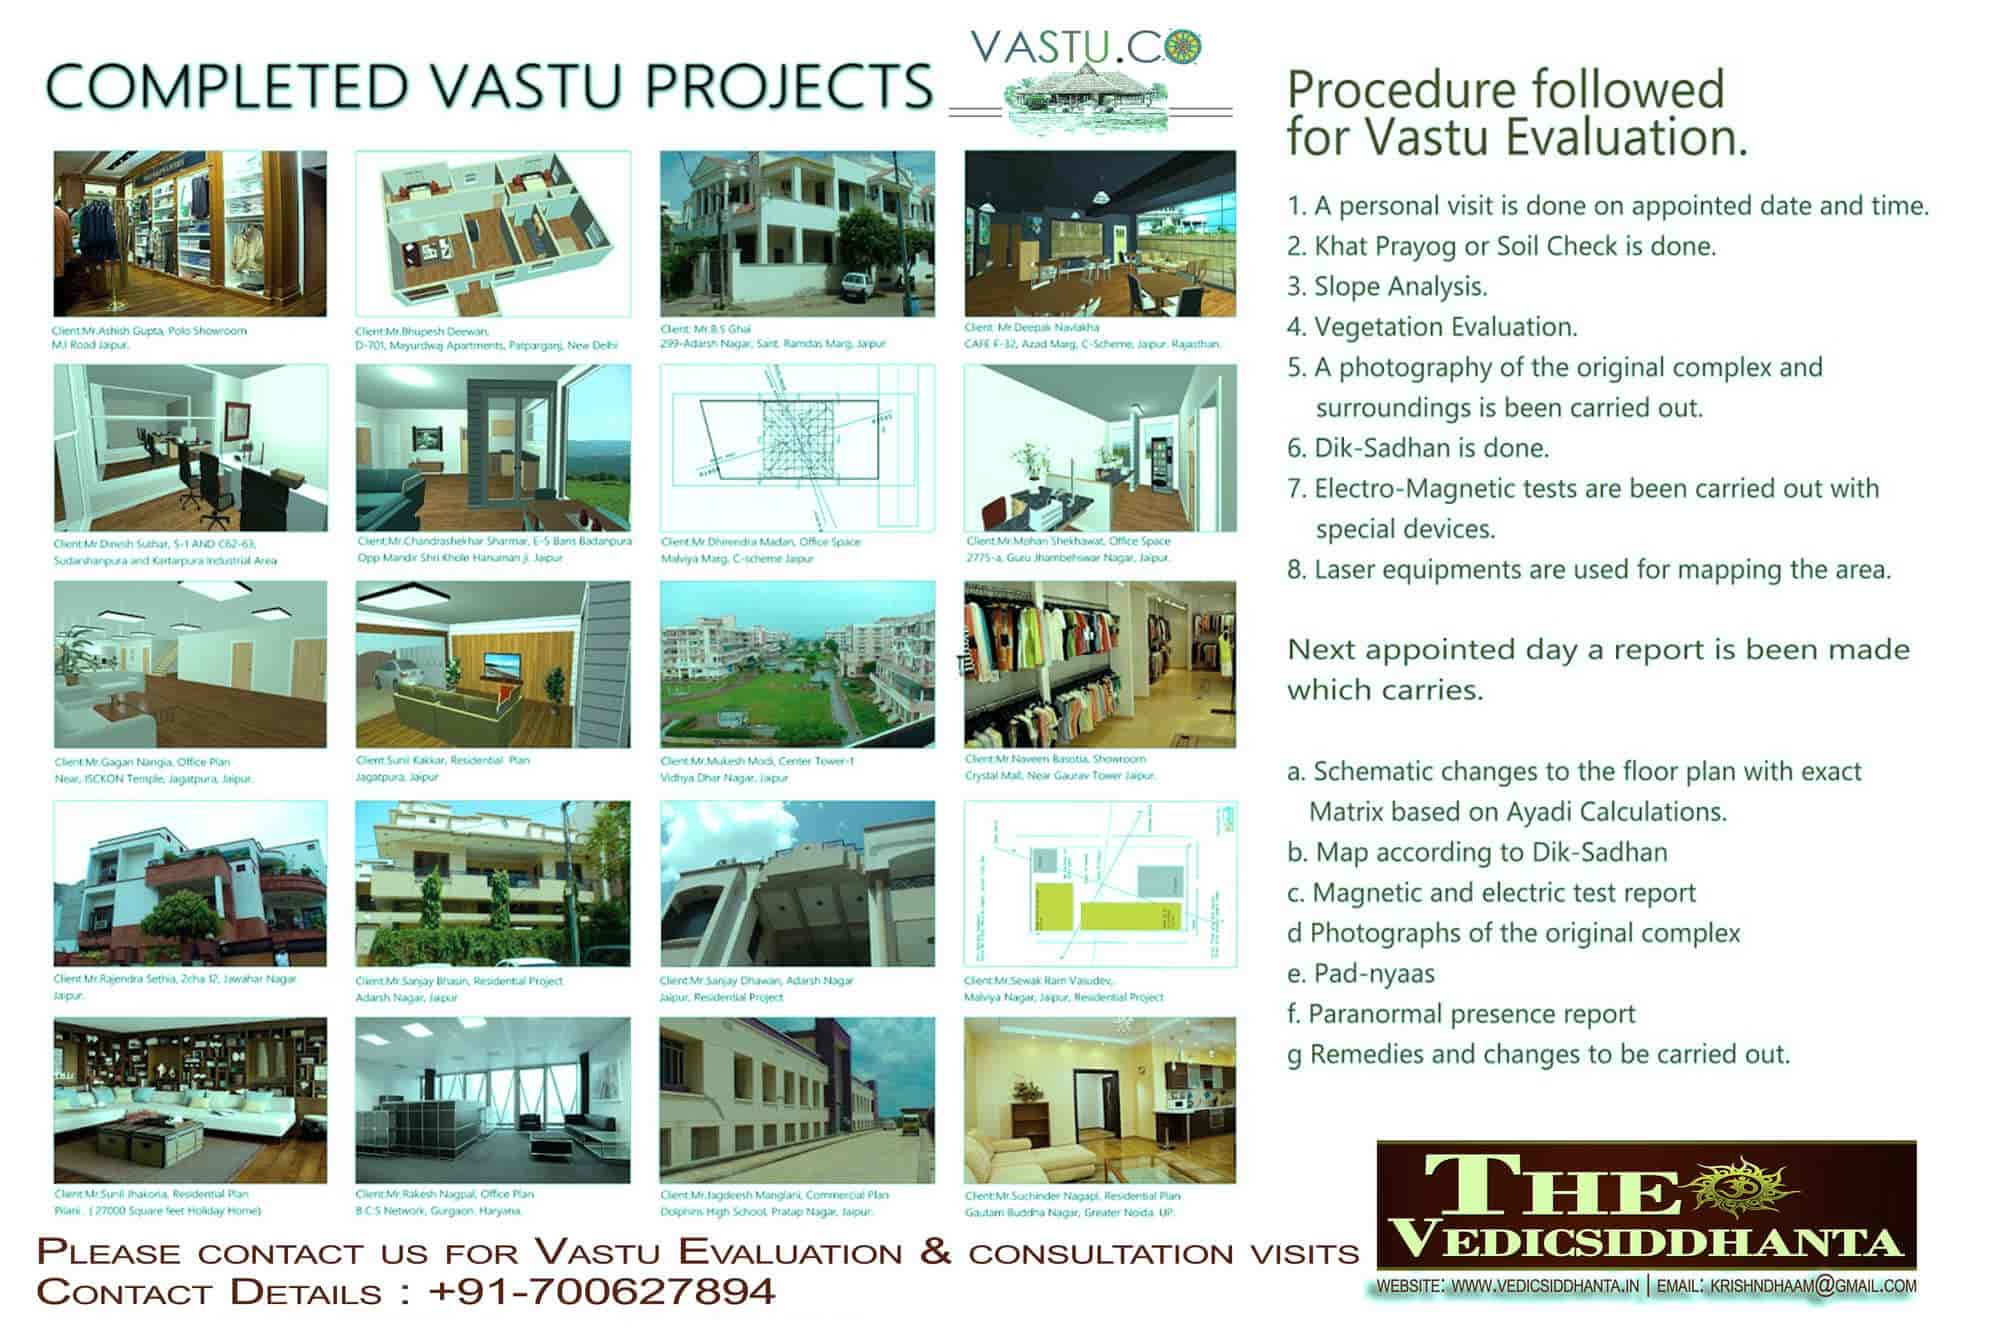 The Vedic Siddhanta, Sainik Colony - Astrologers in Remote_cities